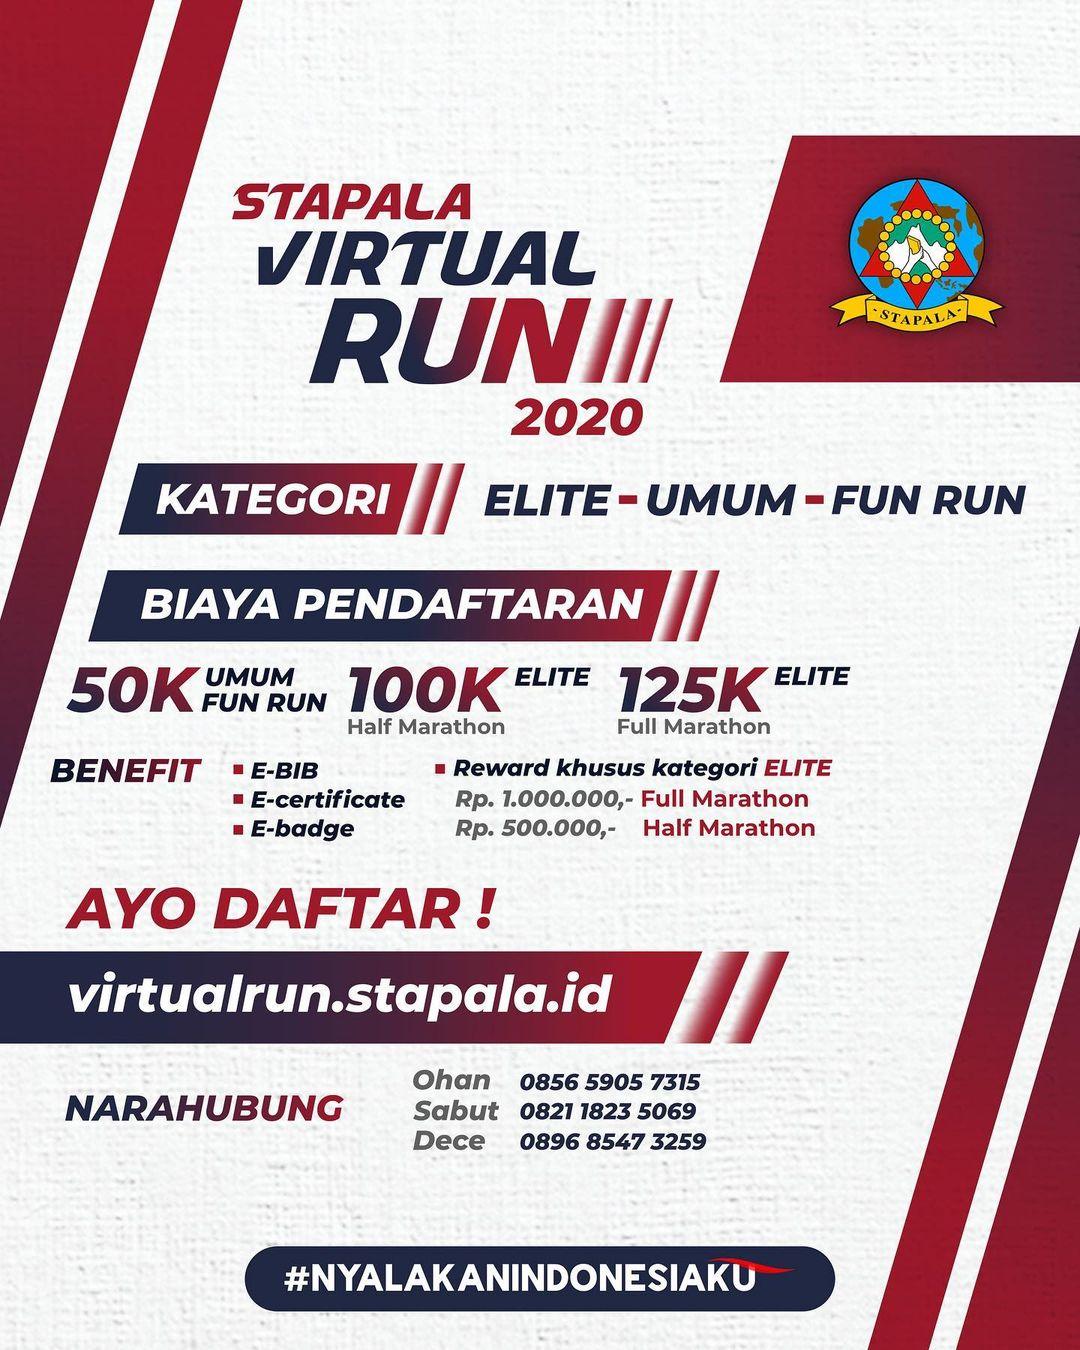 Stapala Virtual Run • 2020